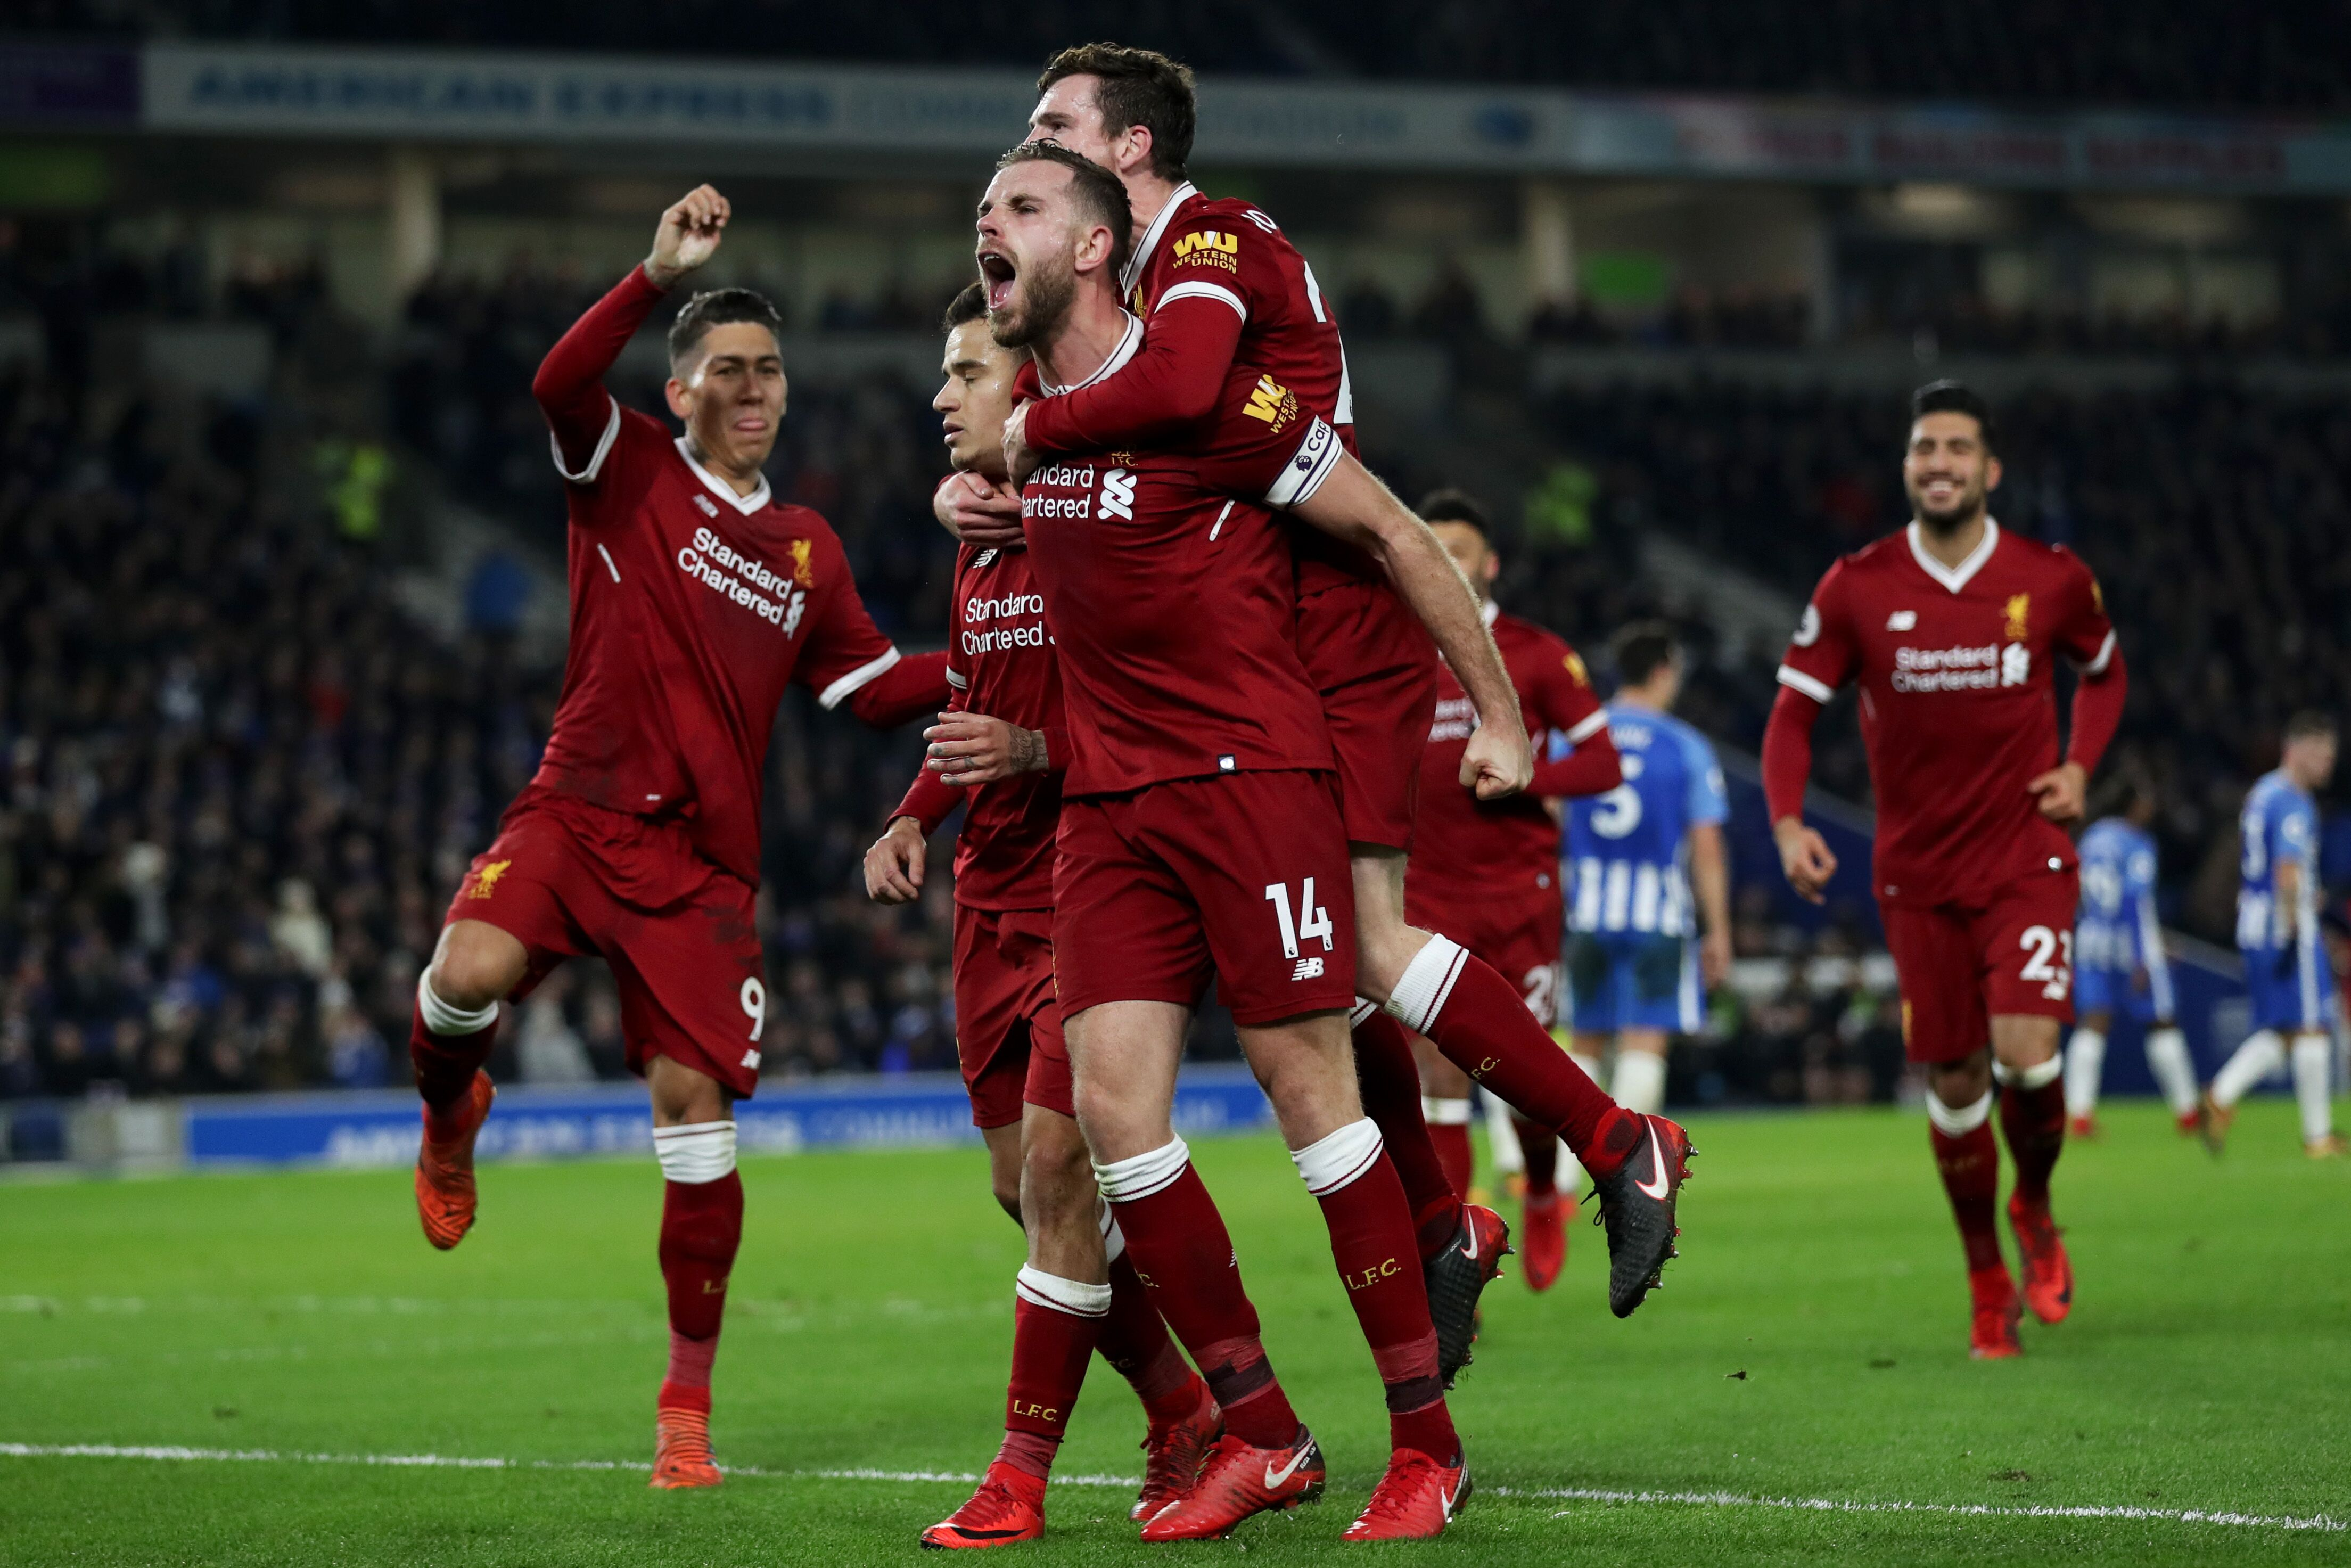 Bournemouth Liverpool Live Stream: Bournemouth Vs. Liverpool Live Stream: Watch Premier